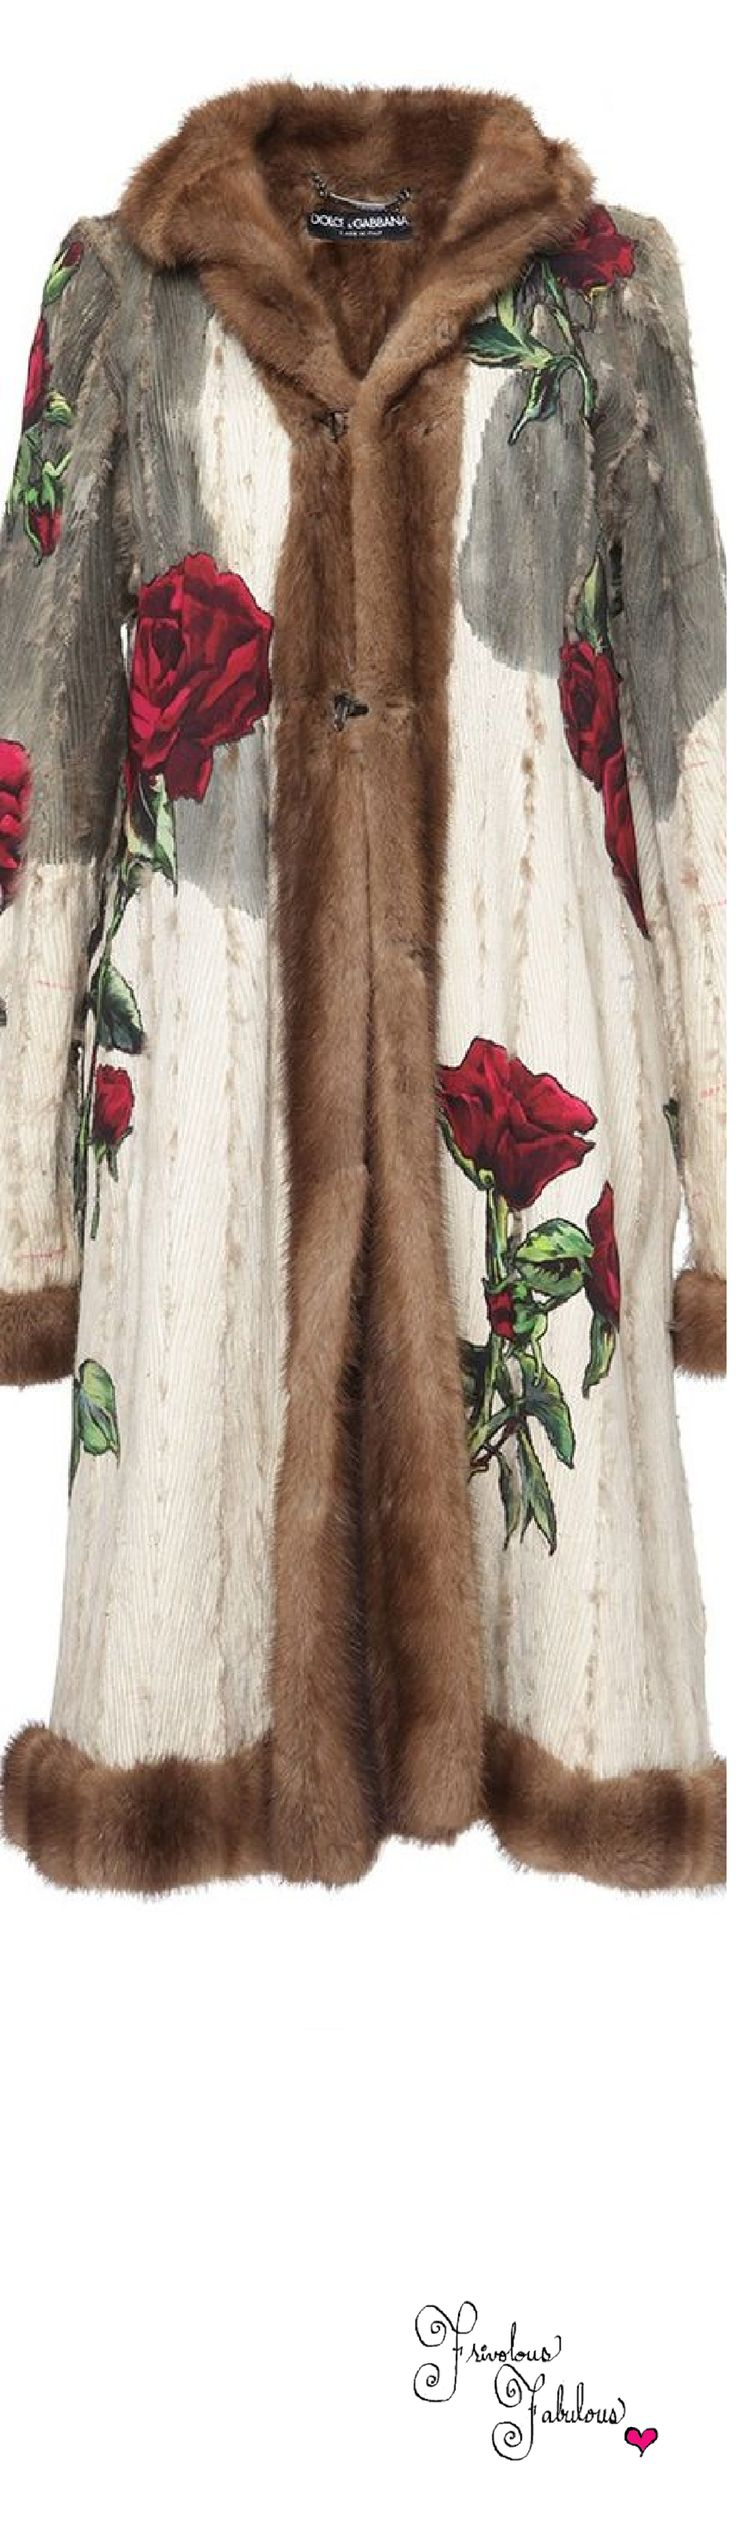 Frivolous Fabulous - Dolce & Gabbana Love Fall Winter 2015  KathrynHaydenHayden